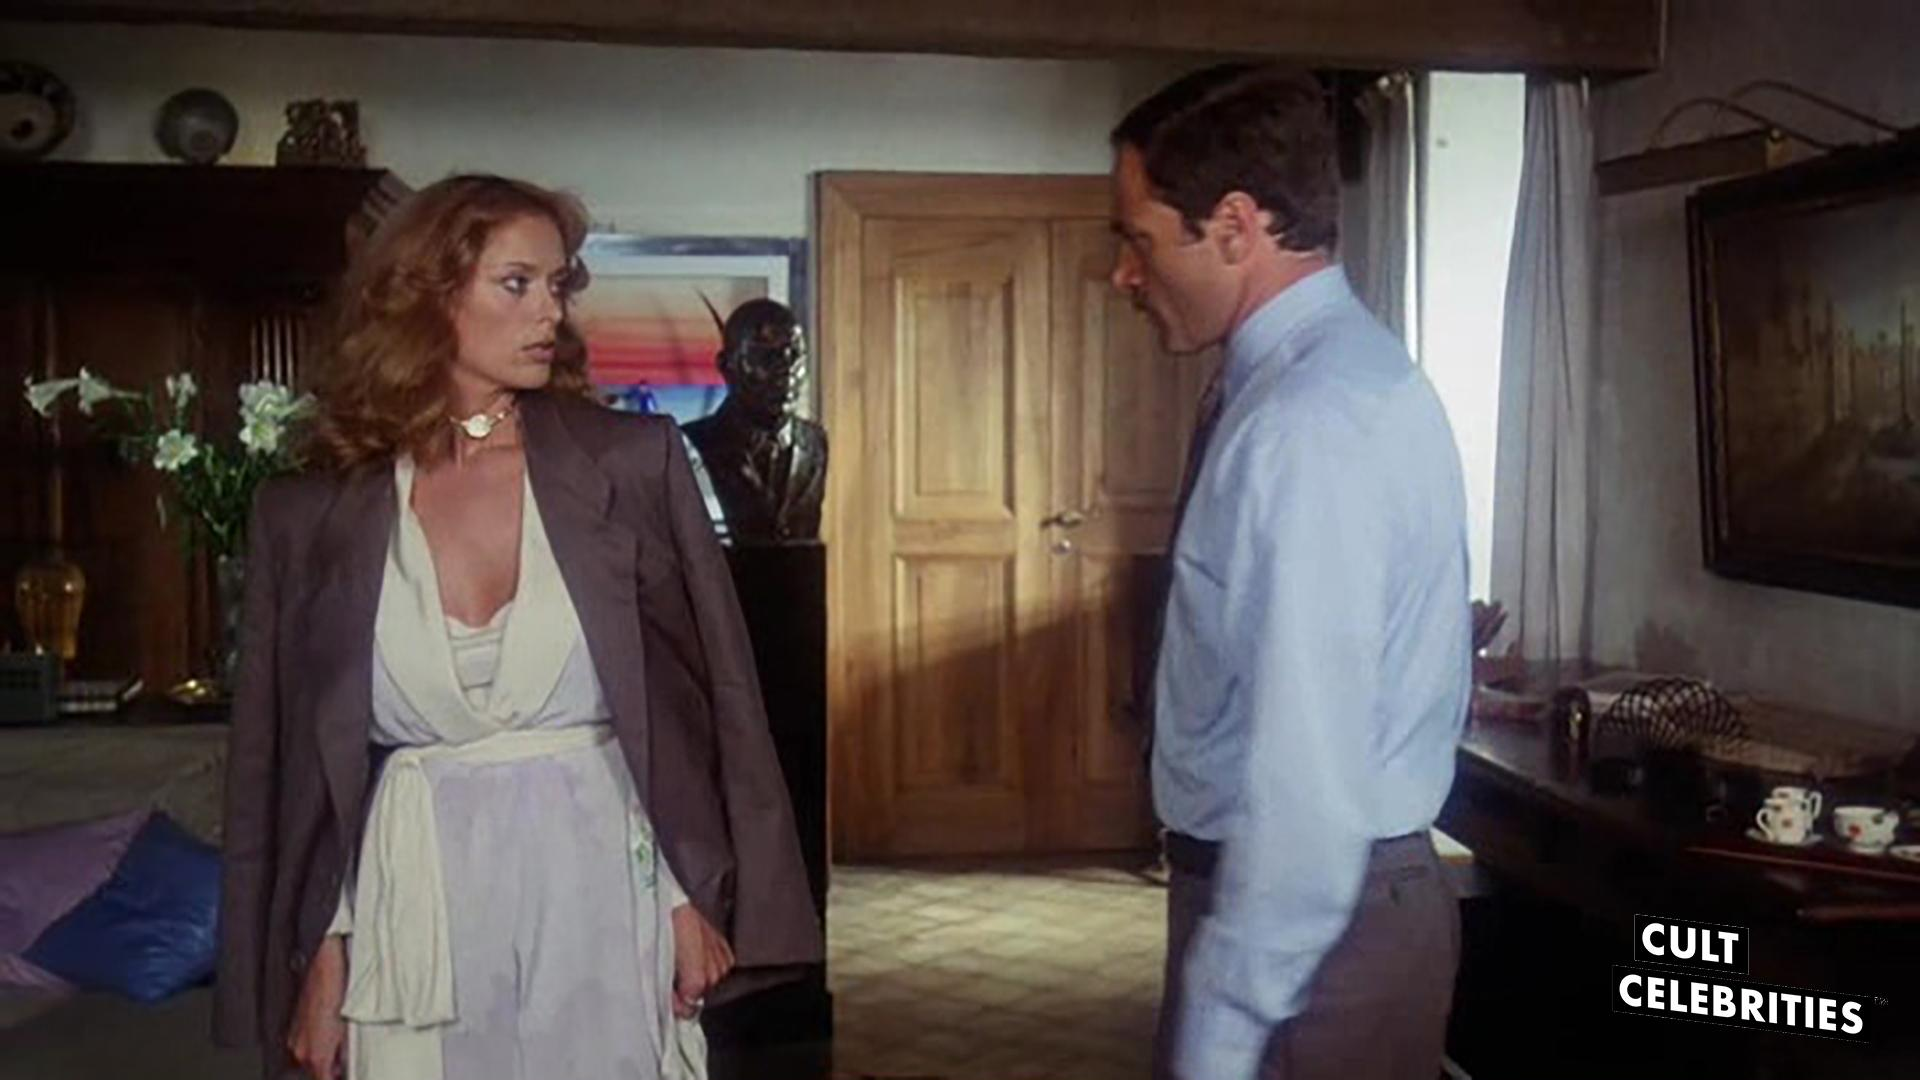 Franco Nero and Sybil Danning in The Salamander (1981)